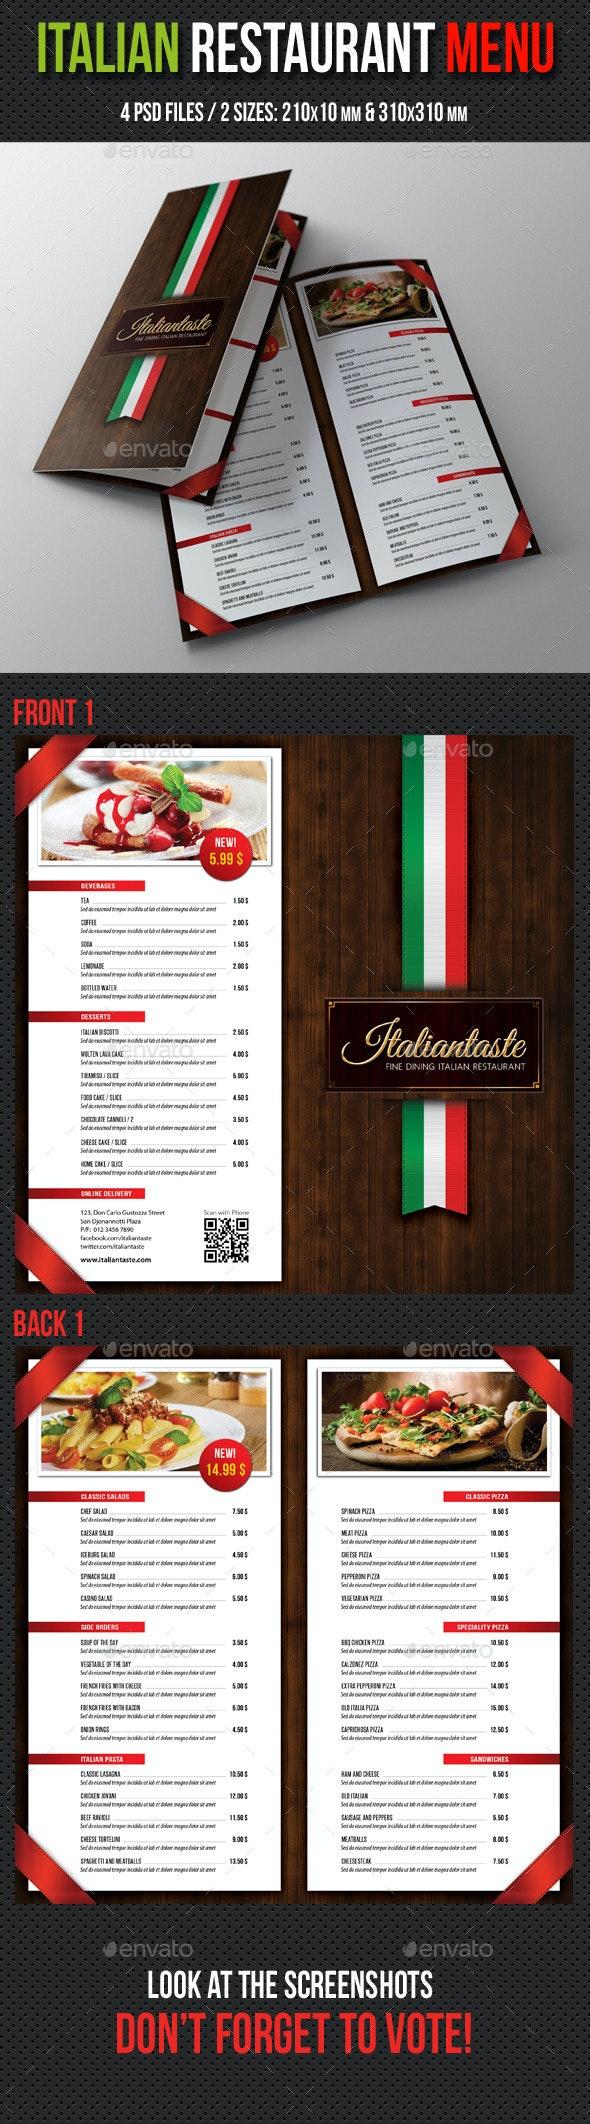 Italian Restaurant Menu Brochure - Food Menus Print Templates